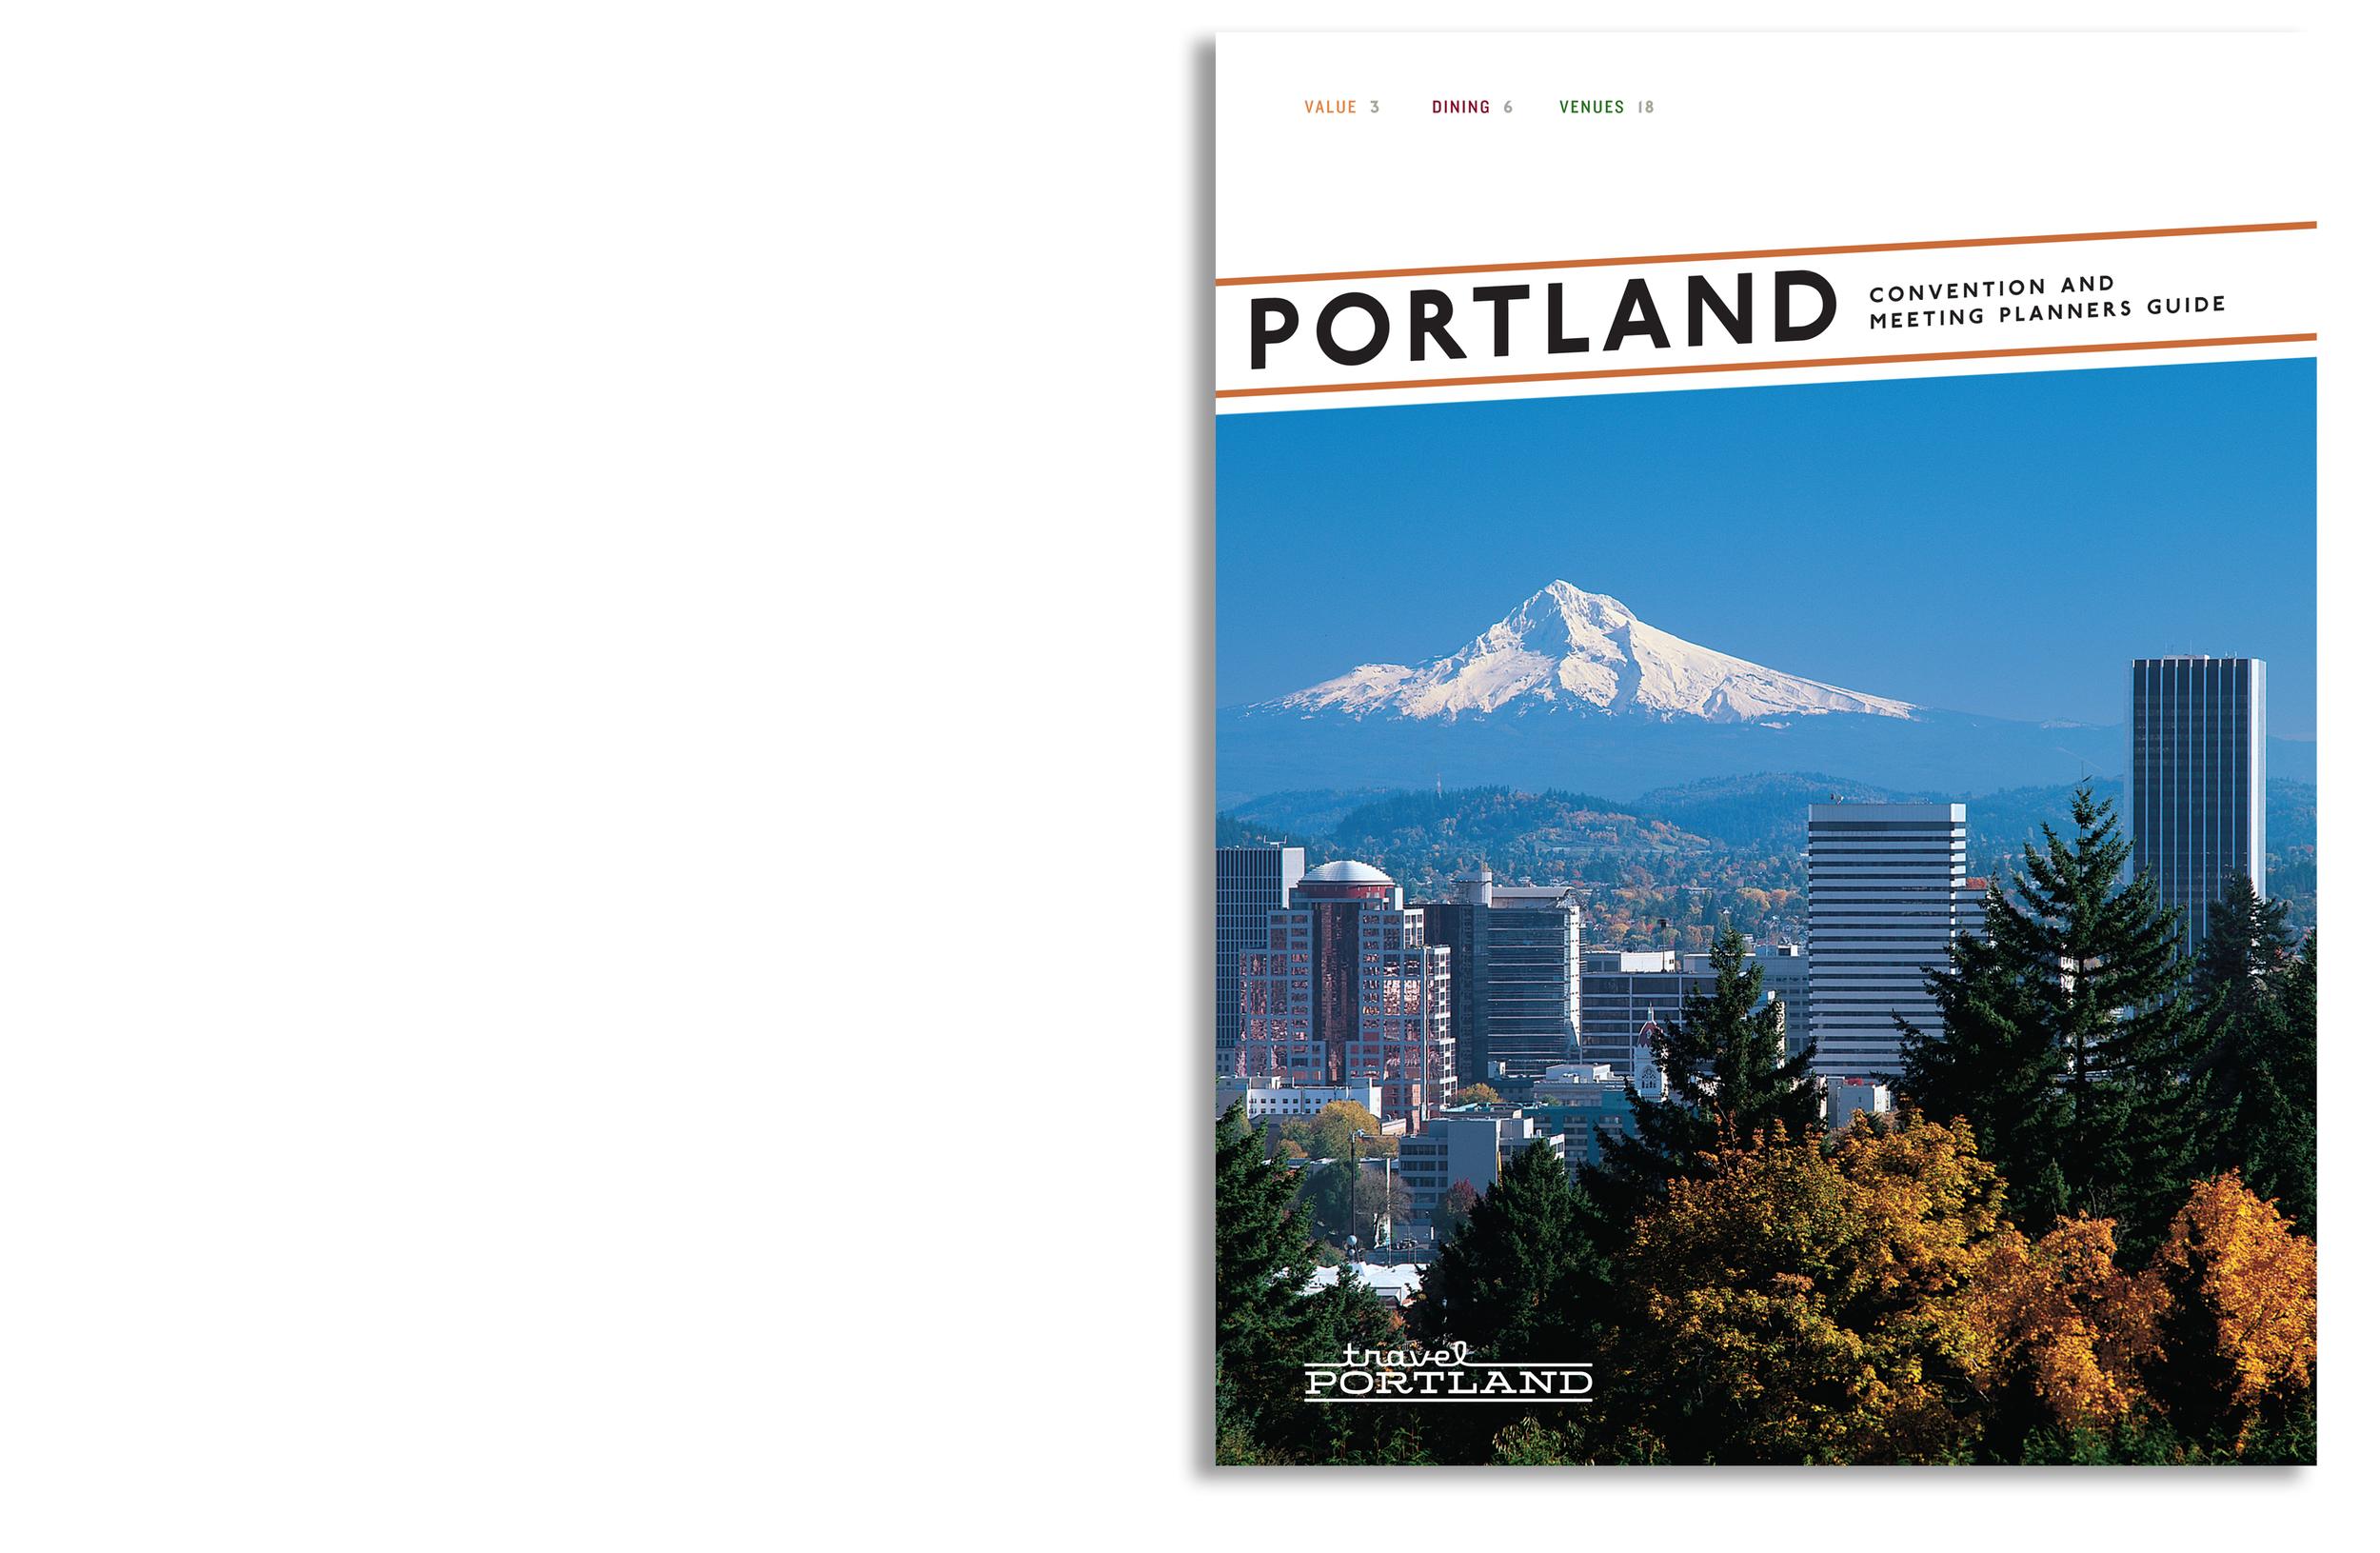 travelportlandmpg-cover.jpg